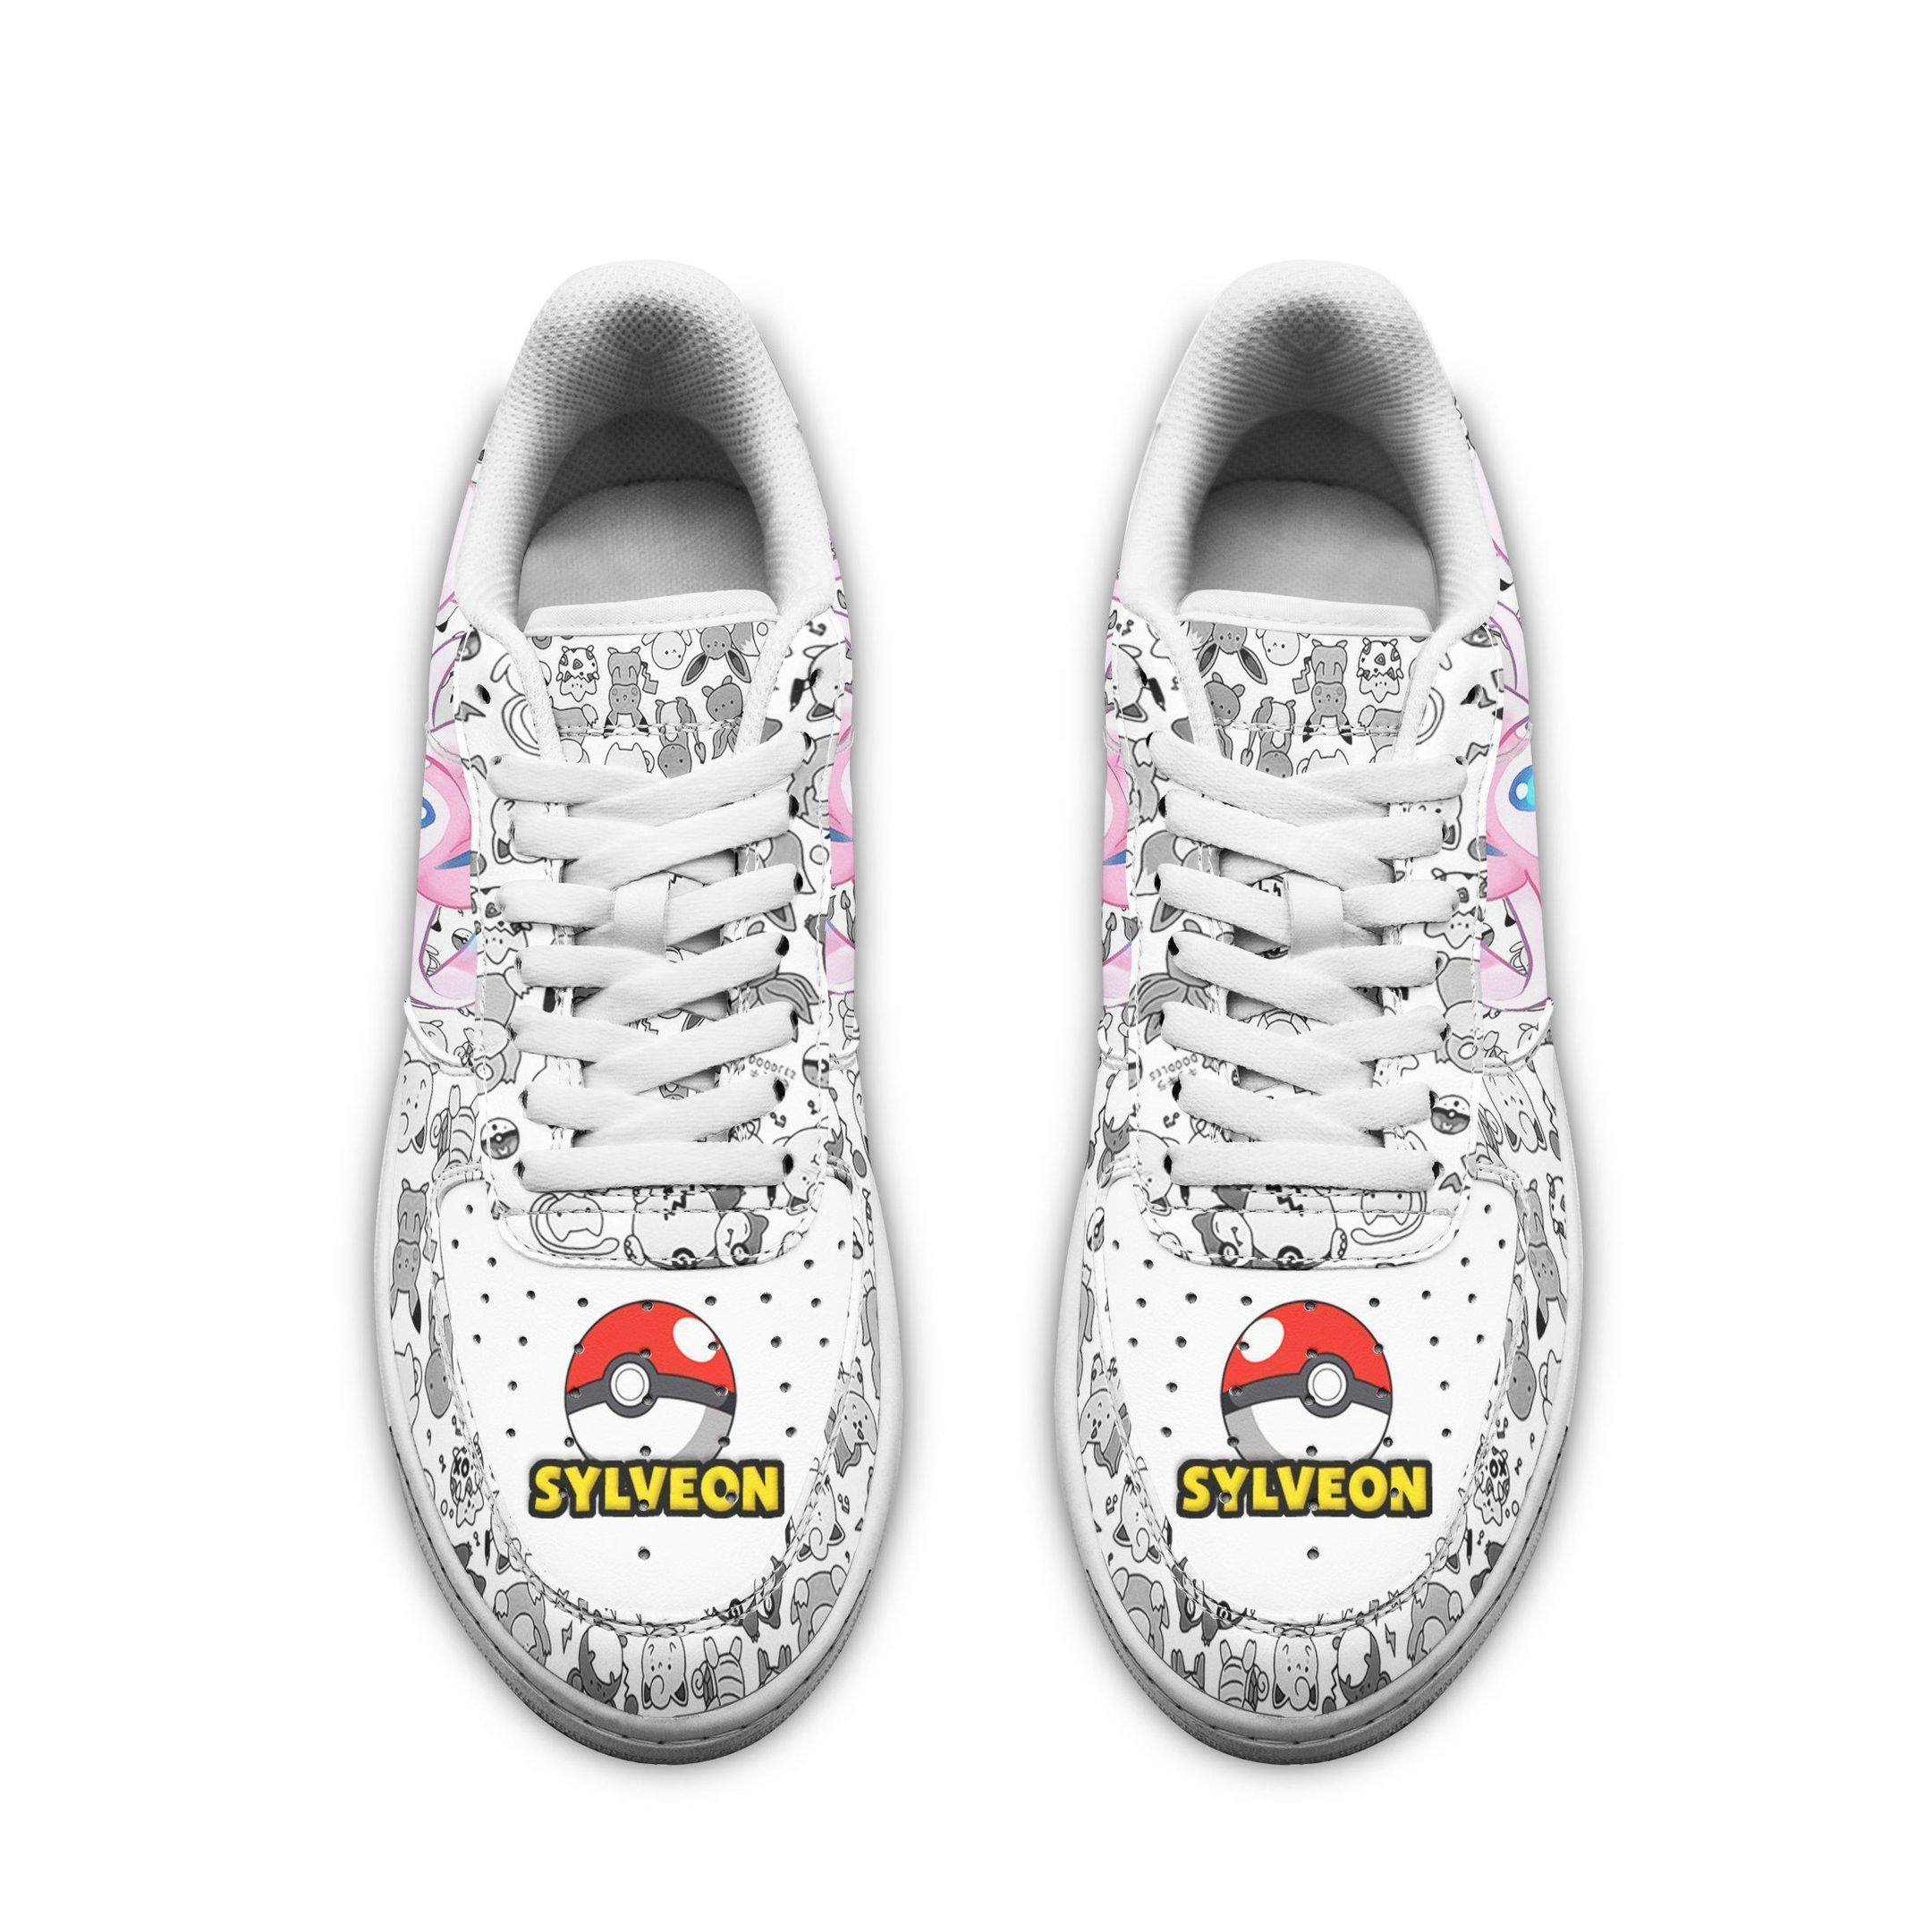 Sylveon Air Shoes Pokemon Shoes Fan Gift Idea GO1012